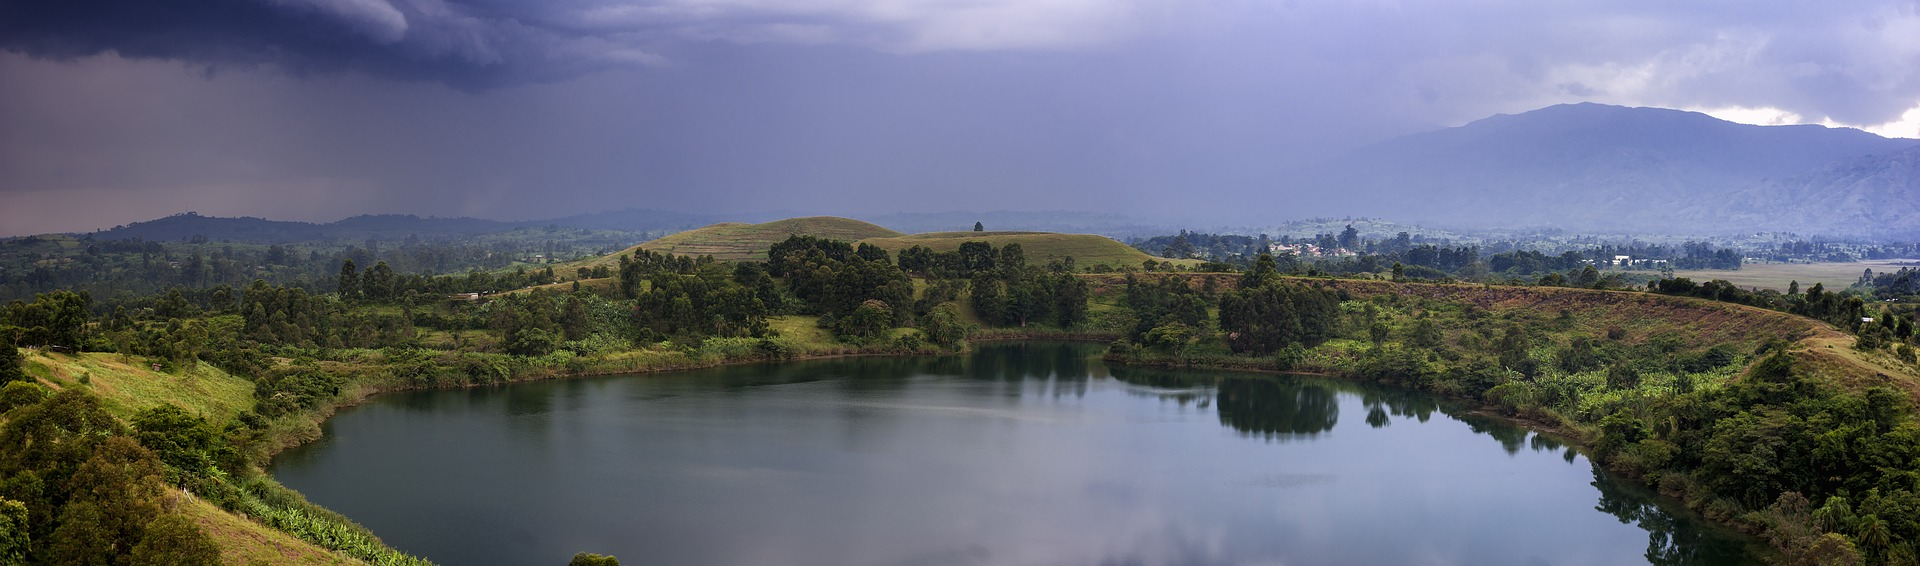 rwenzori mountain